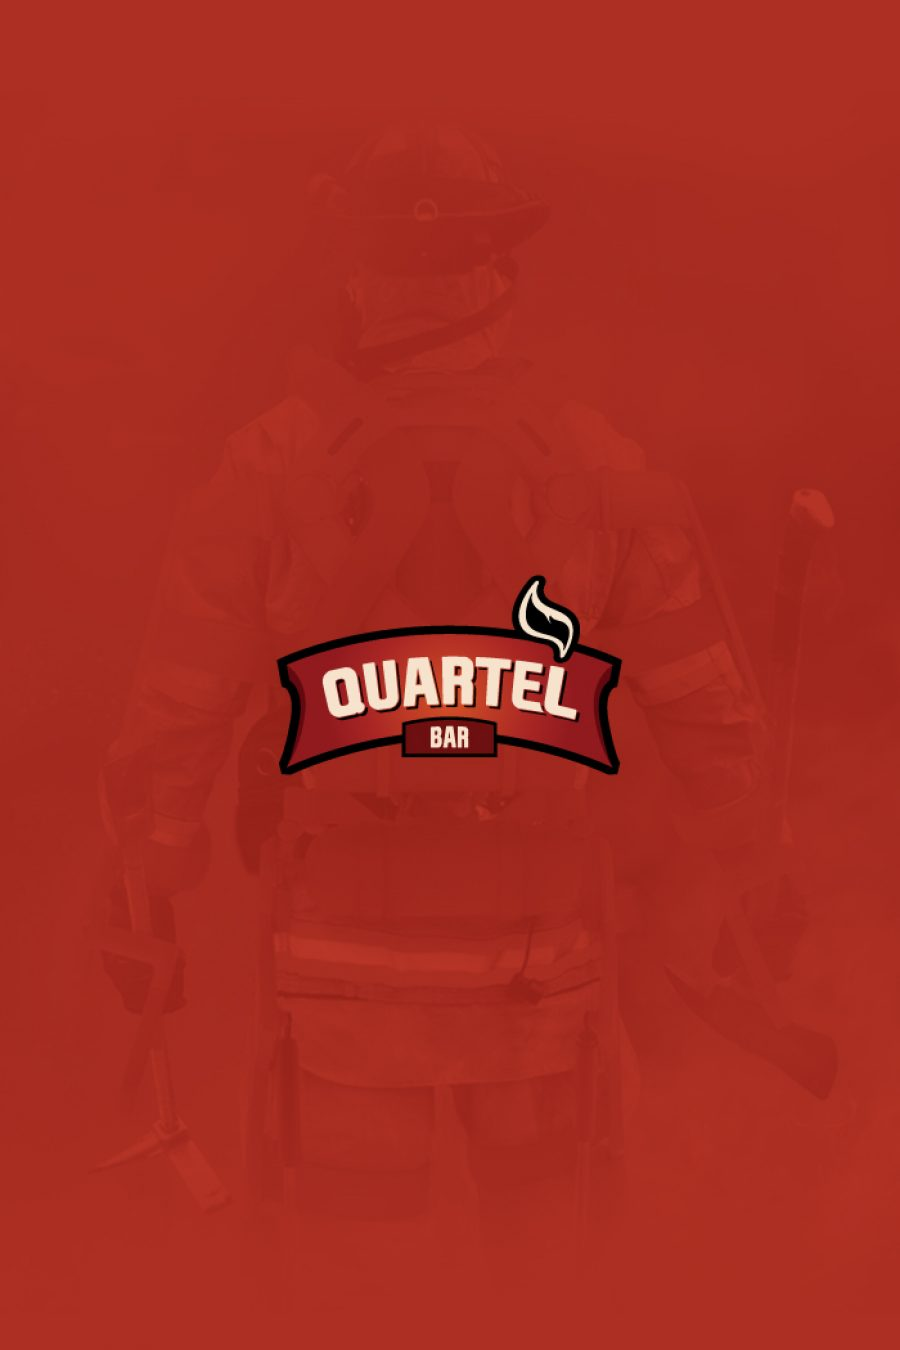 Quartel Bar